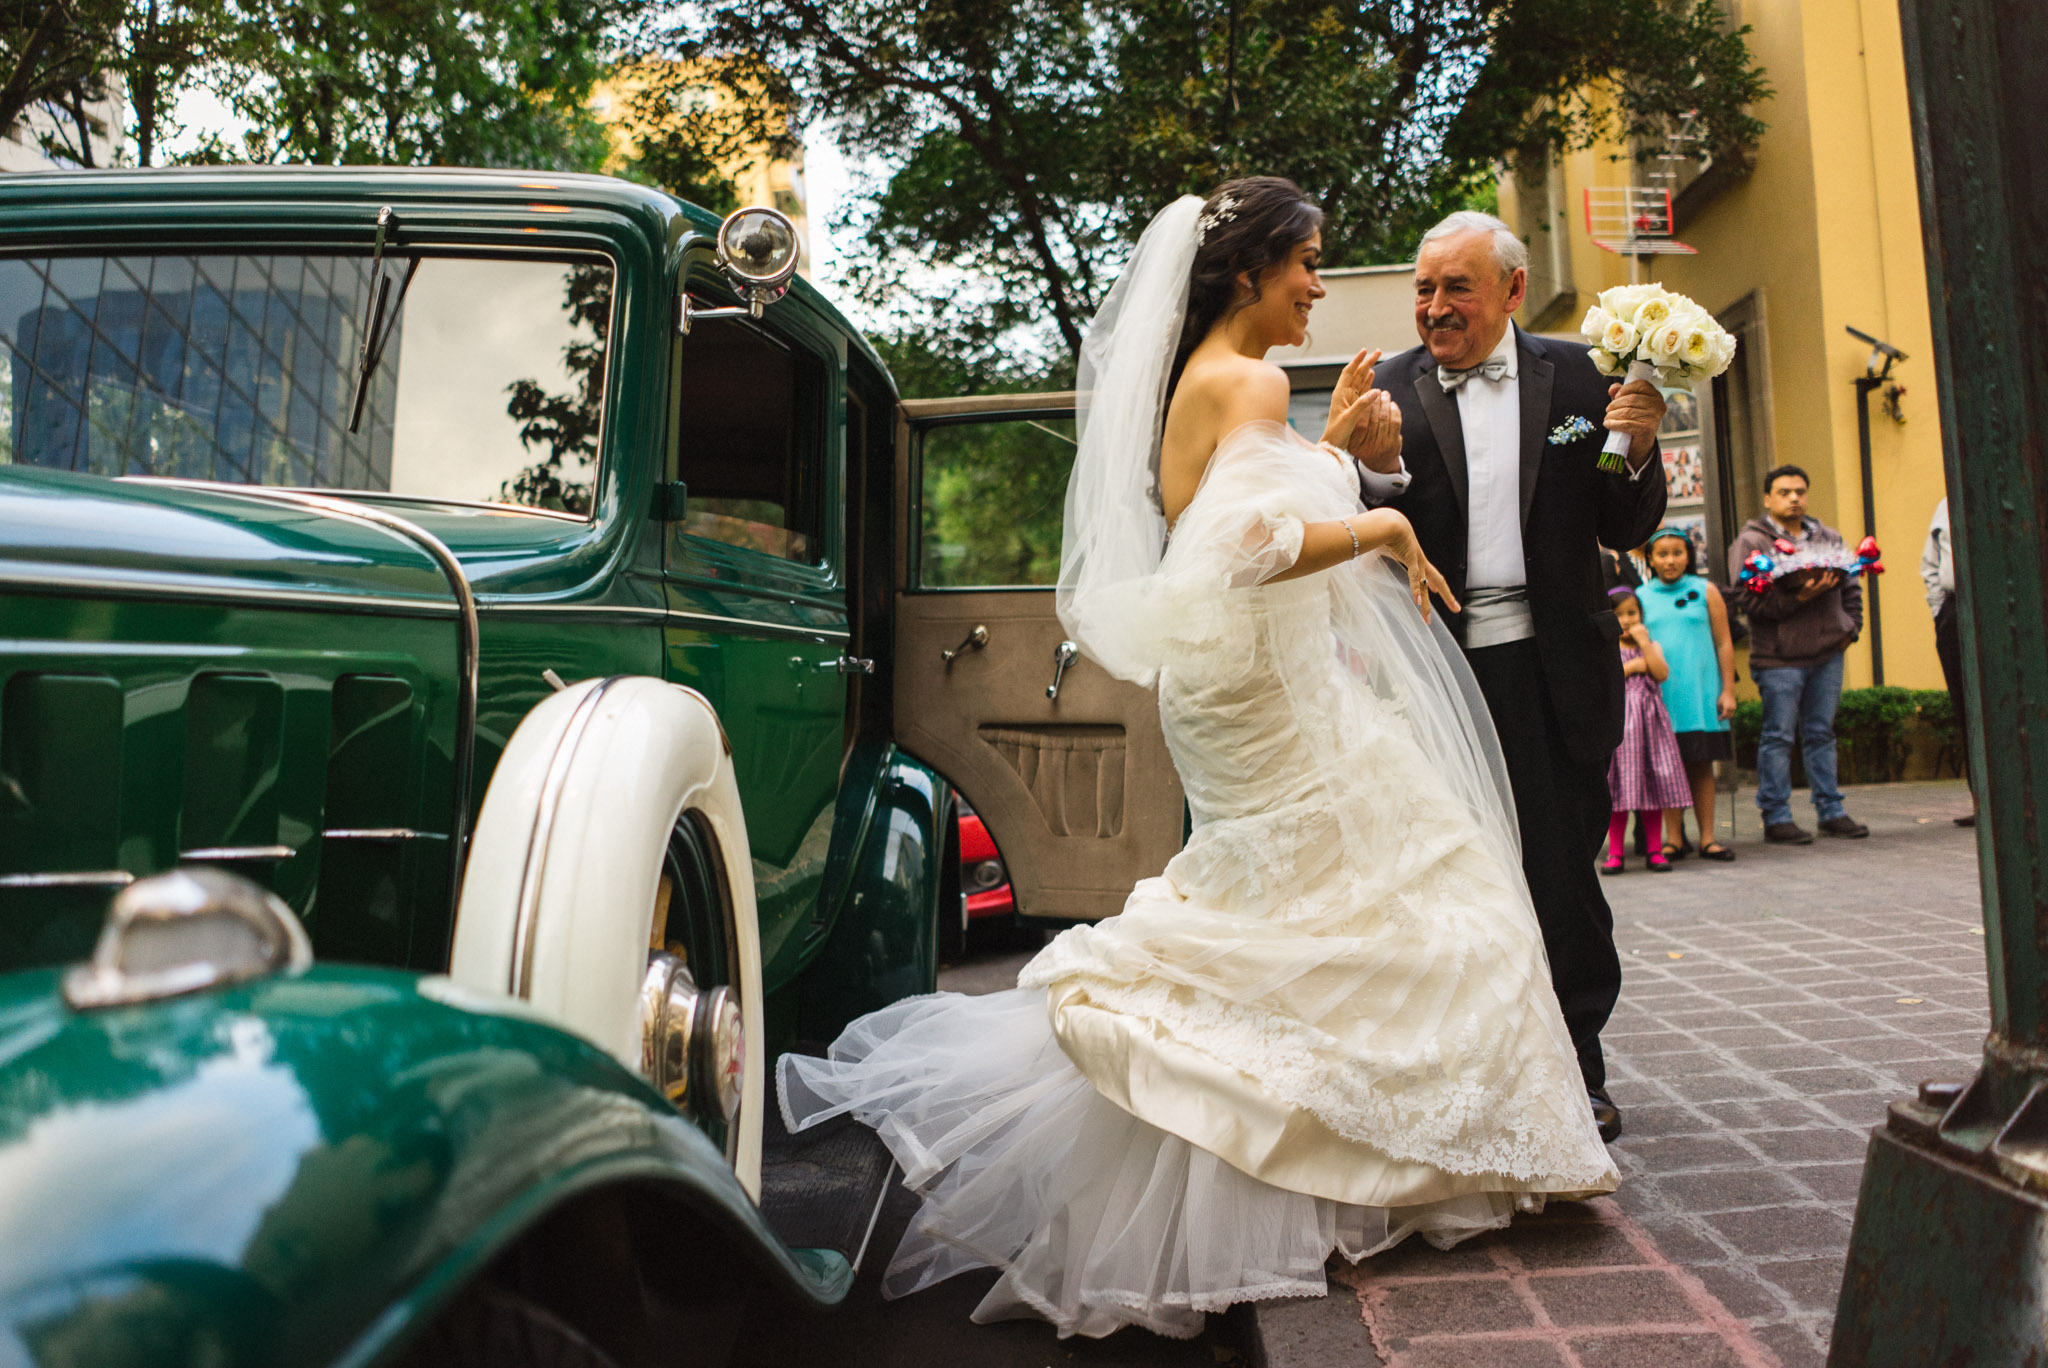 ©www.mauriziosolisbroca.com-20161001maurizio-solis-broca-mexico-canada-wedding-photographer20161001DSC05002-Edit.jpg